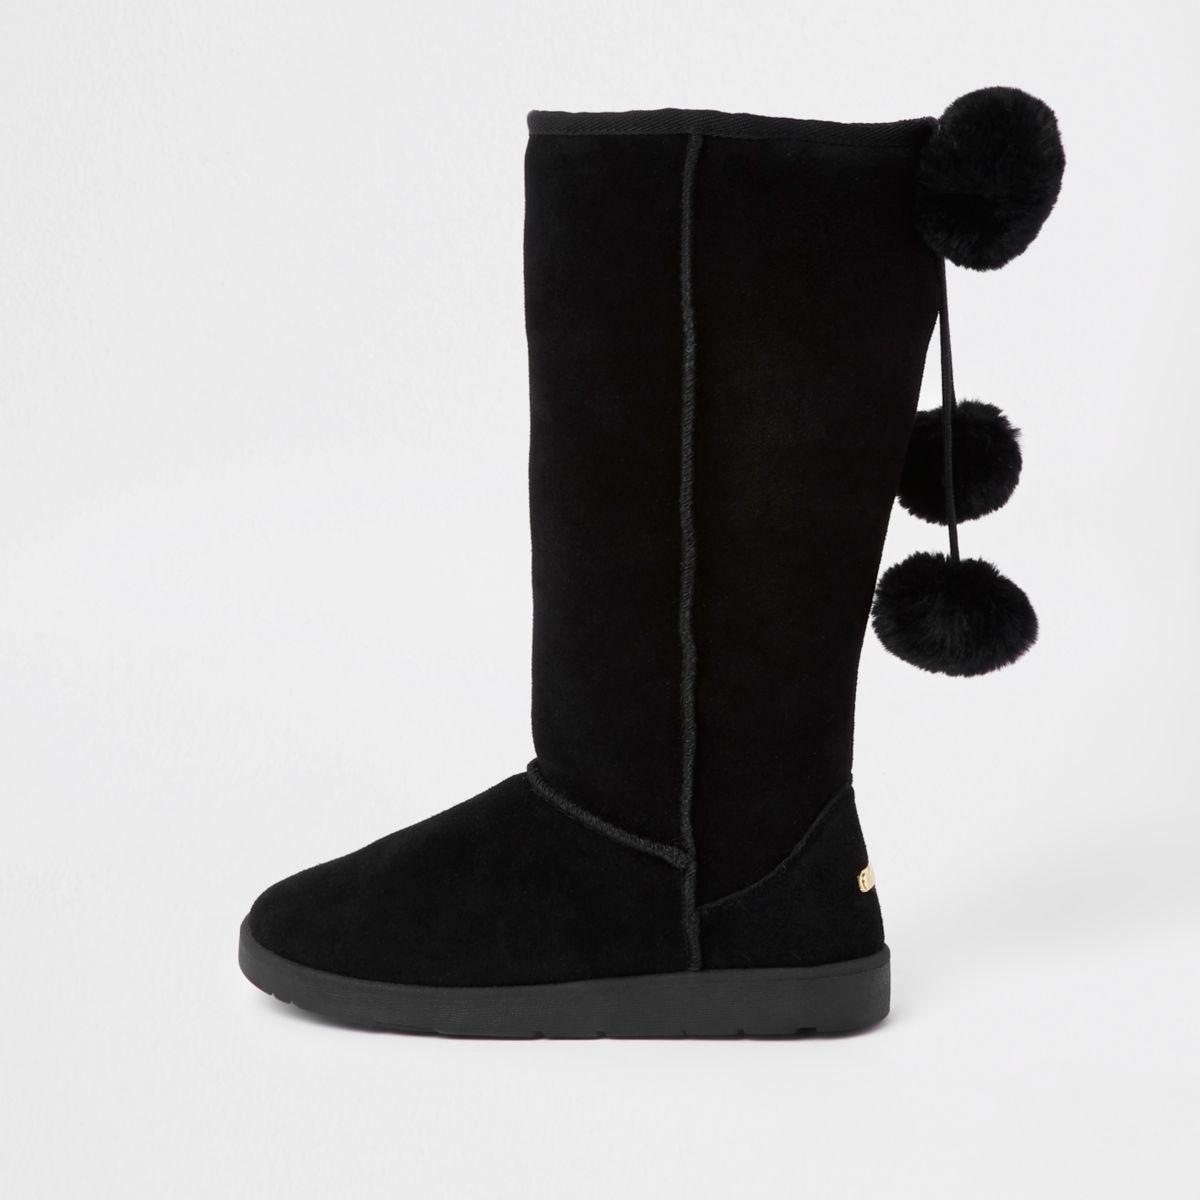 Black suede fur lined pom pom boots